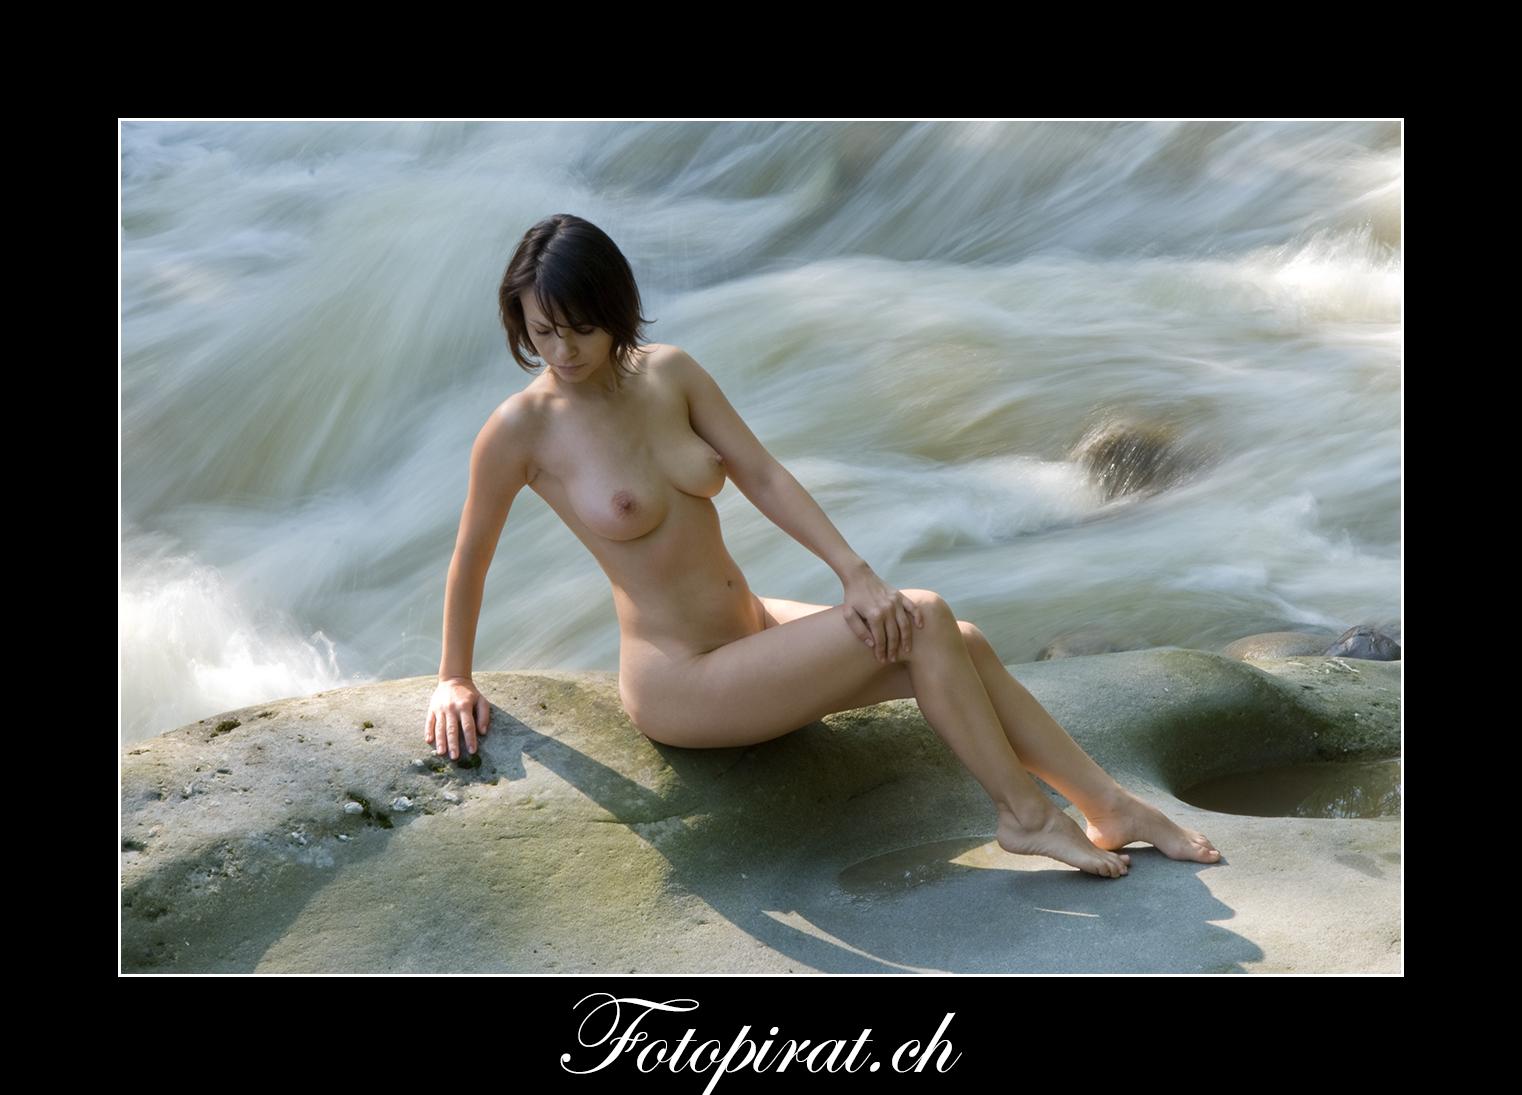 Fotoshooting, Outdoor, Akt, Nackt, Nudeart, Nude, Modelagentur, Fotomodel, erotik, Wasserfallshooting, Wasserfall,